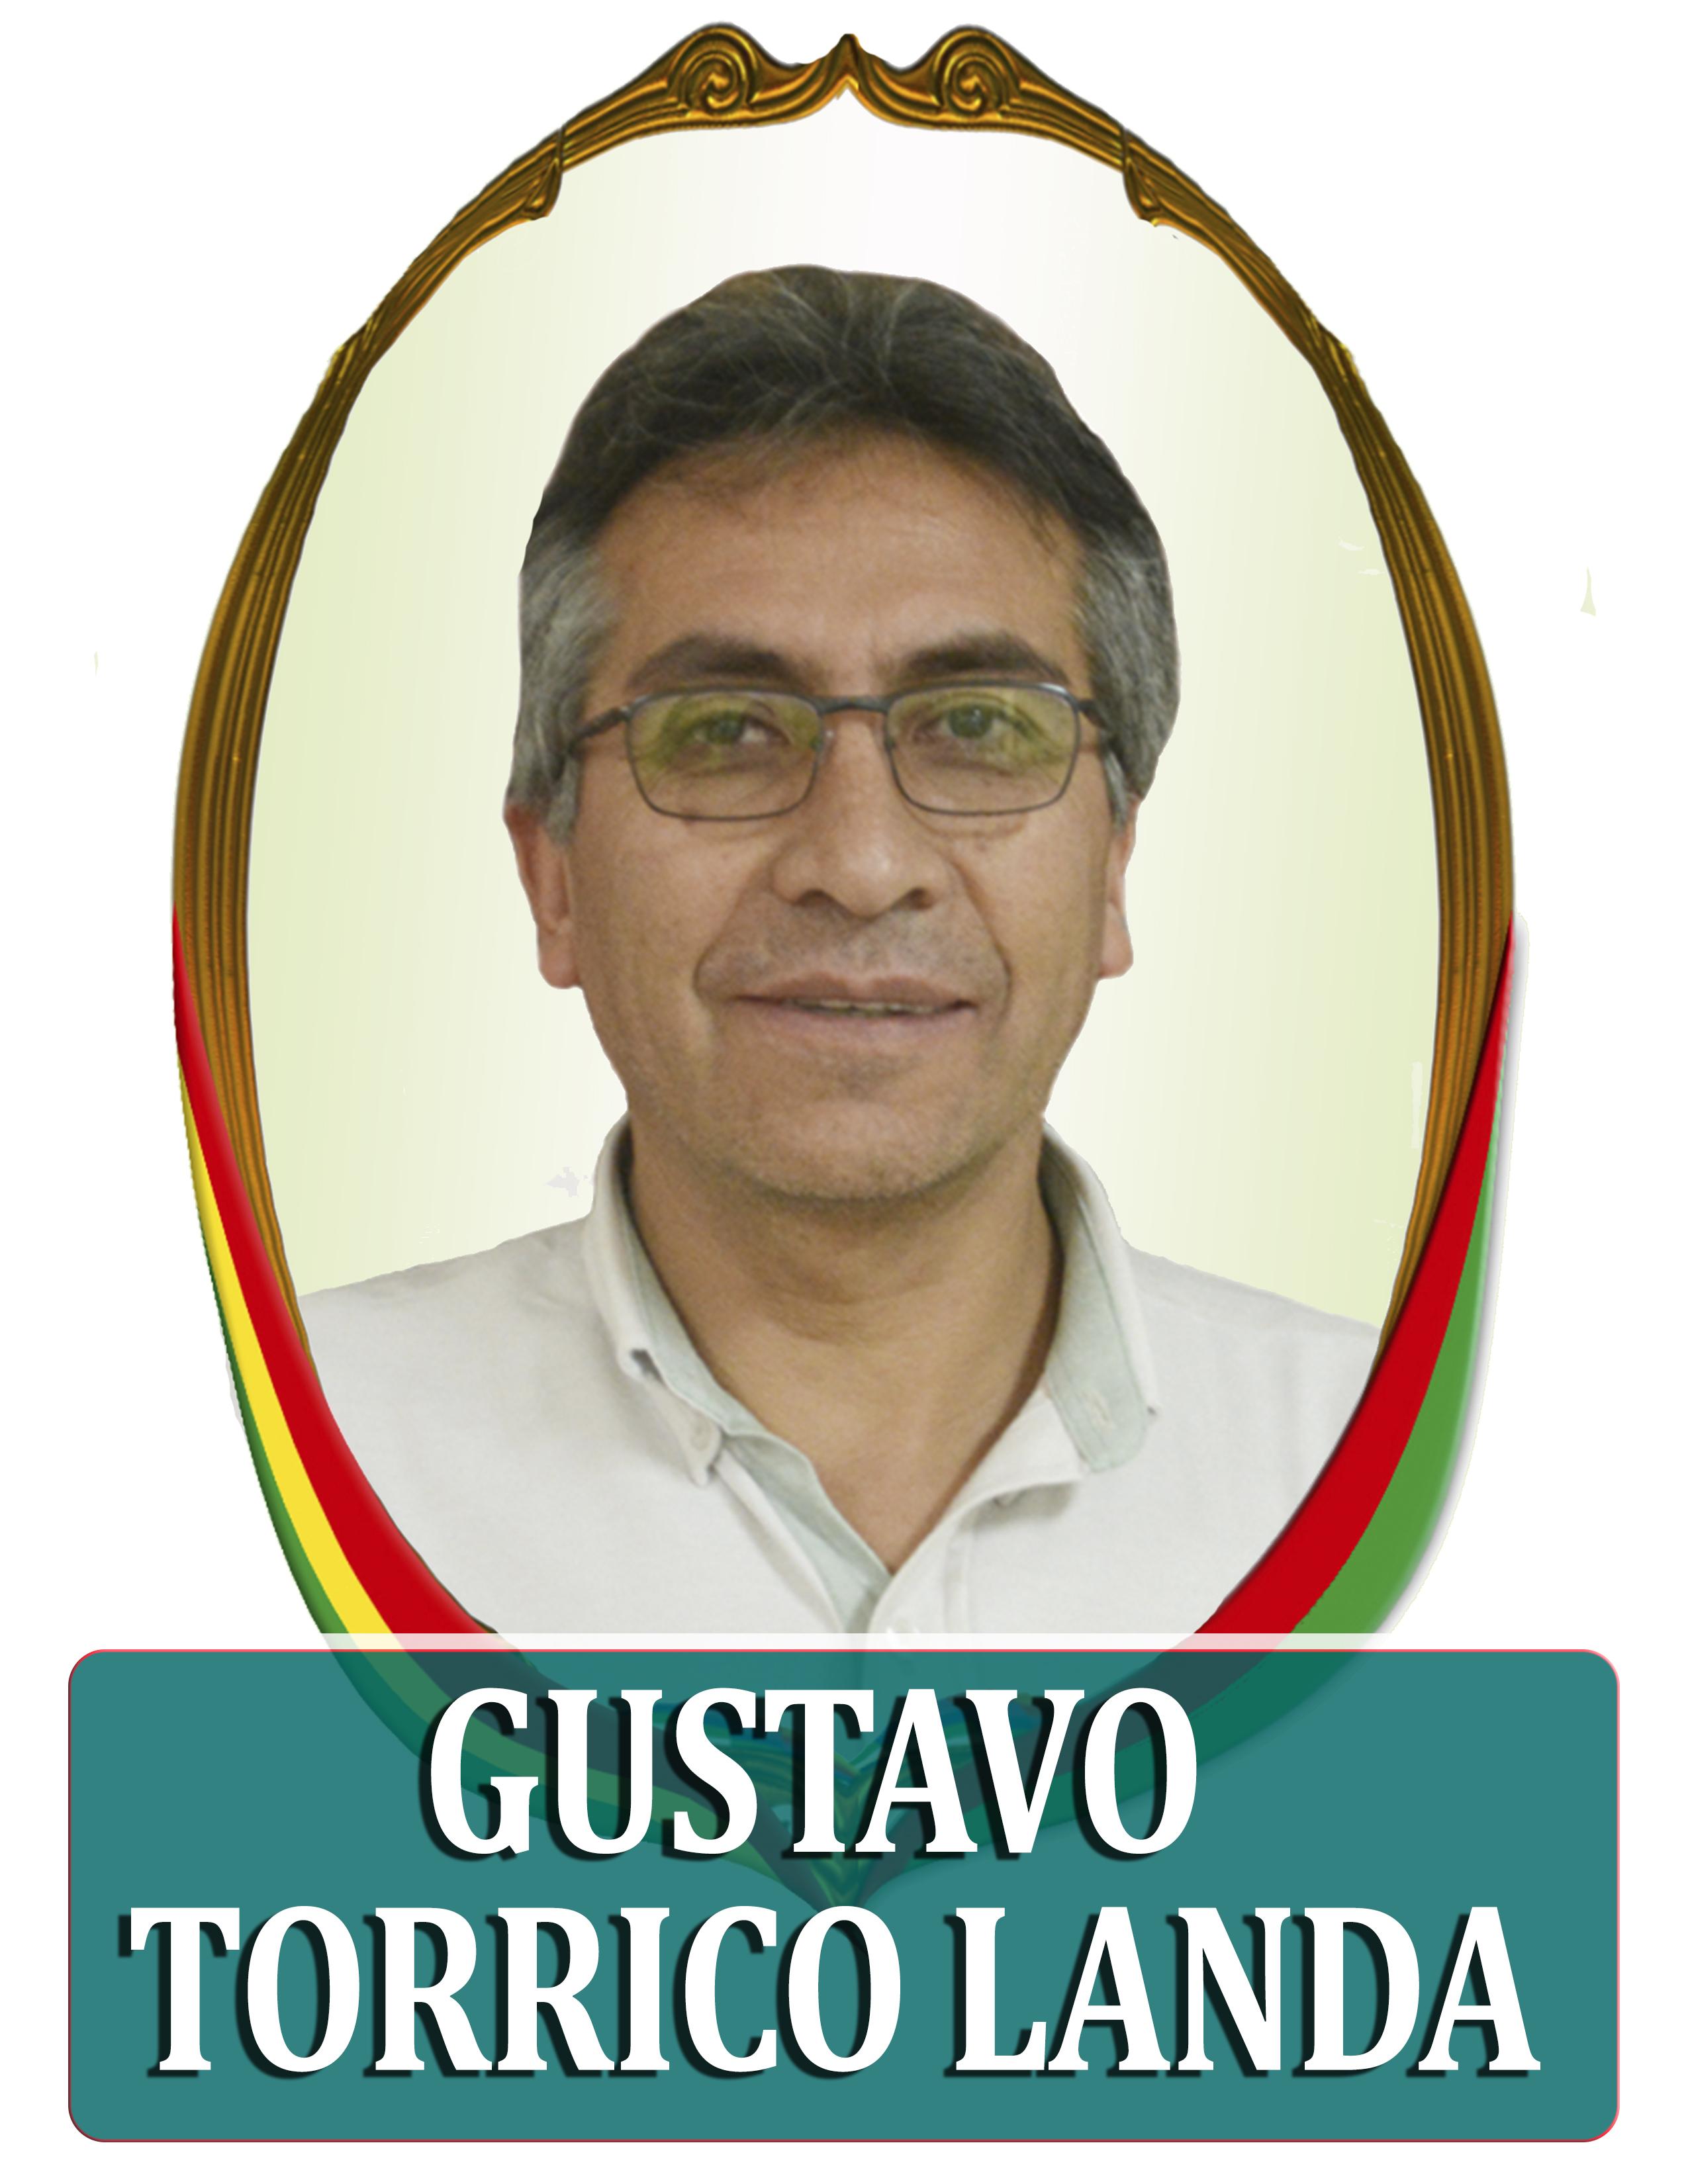 GUSTAVO TORRICO LANDA